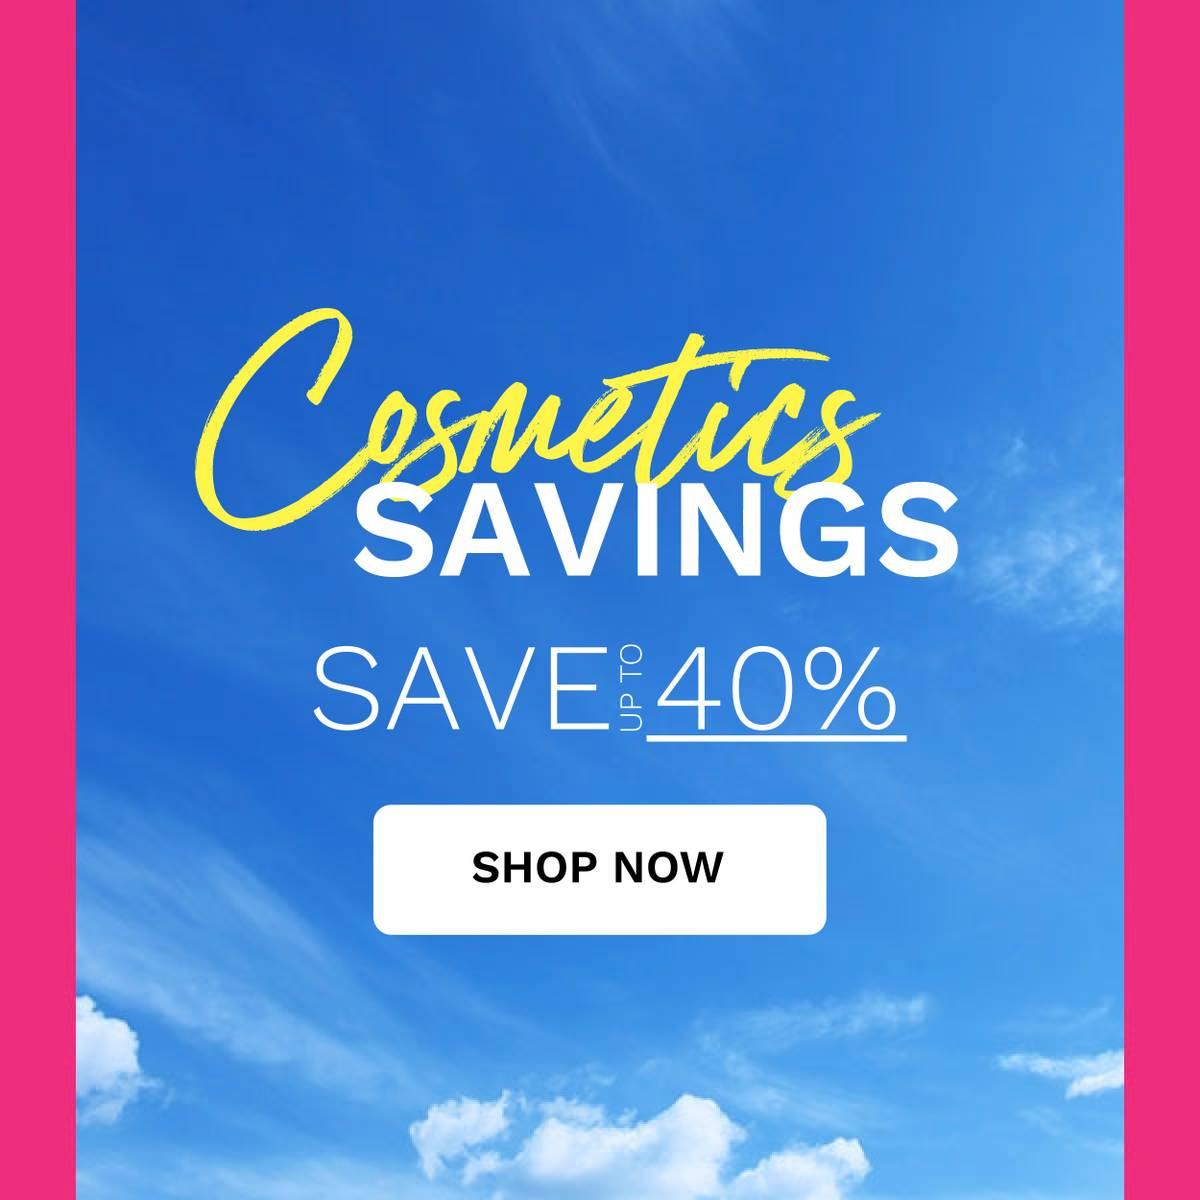 cosmetics savings - bank holiday